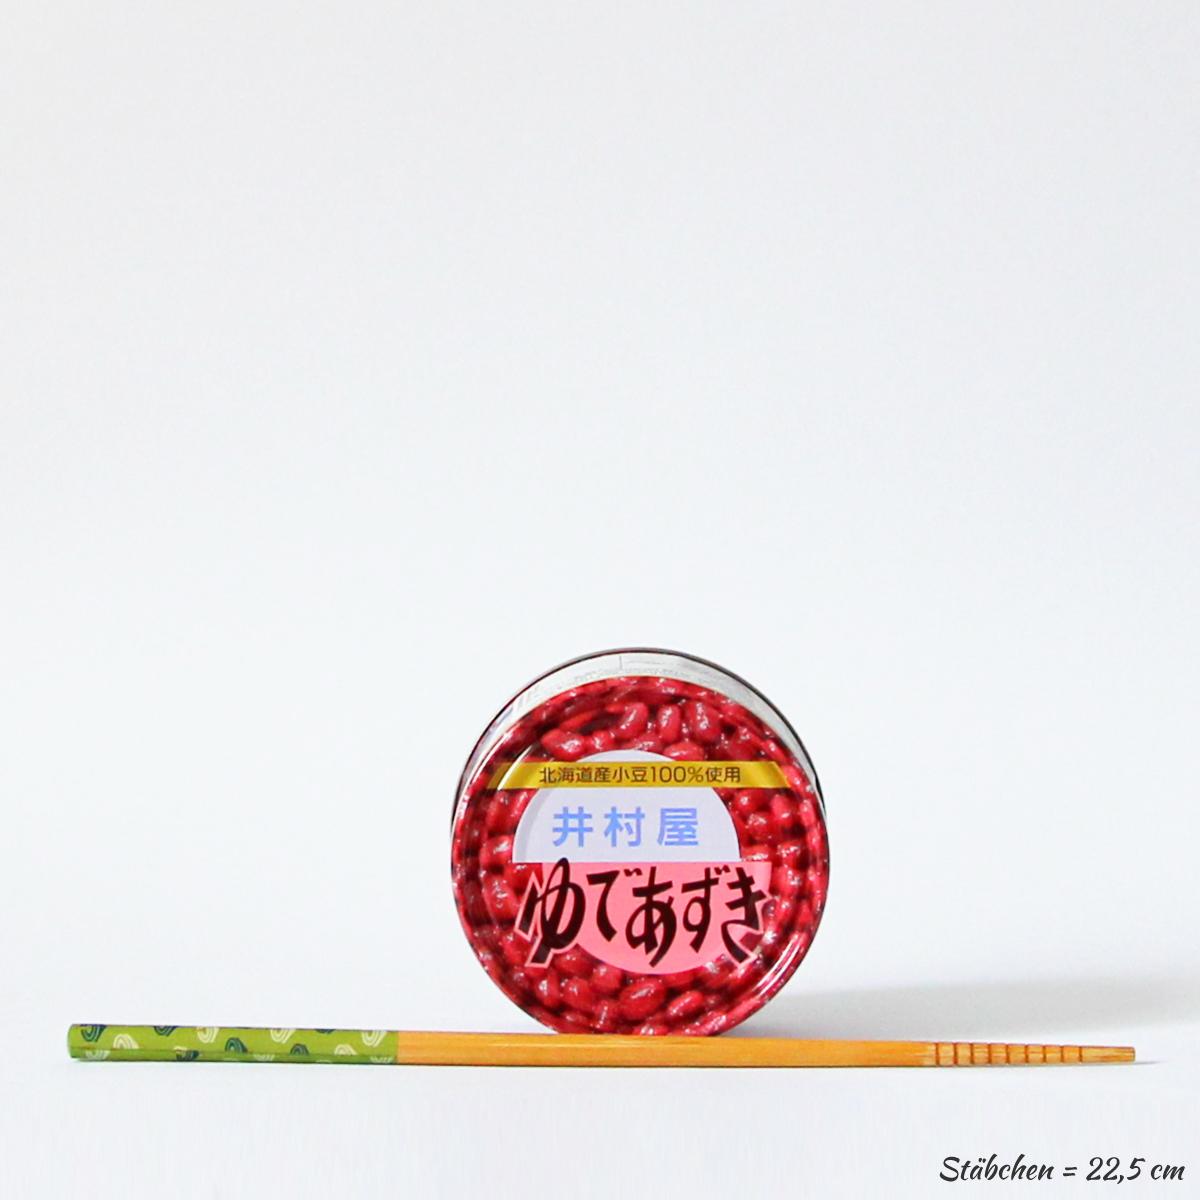 Yude Azuki 210g (Anko, grobe rote Bohnenpaste), IMURAYA